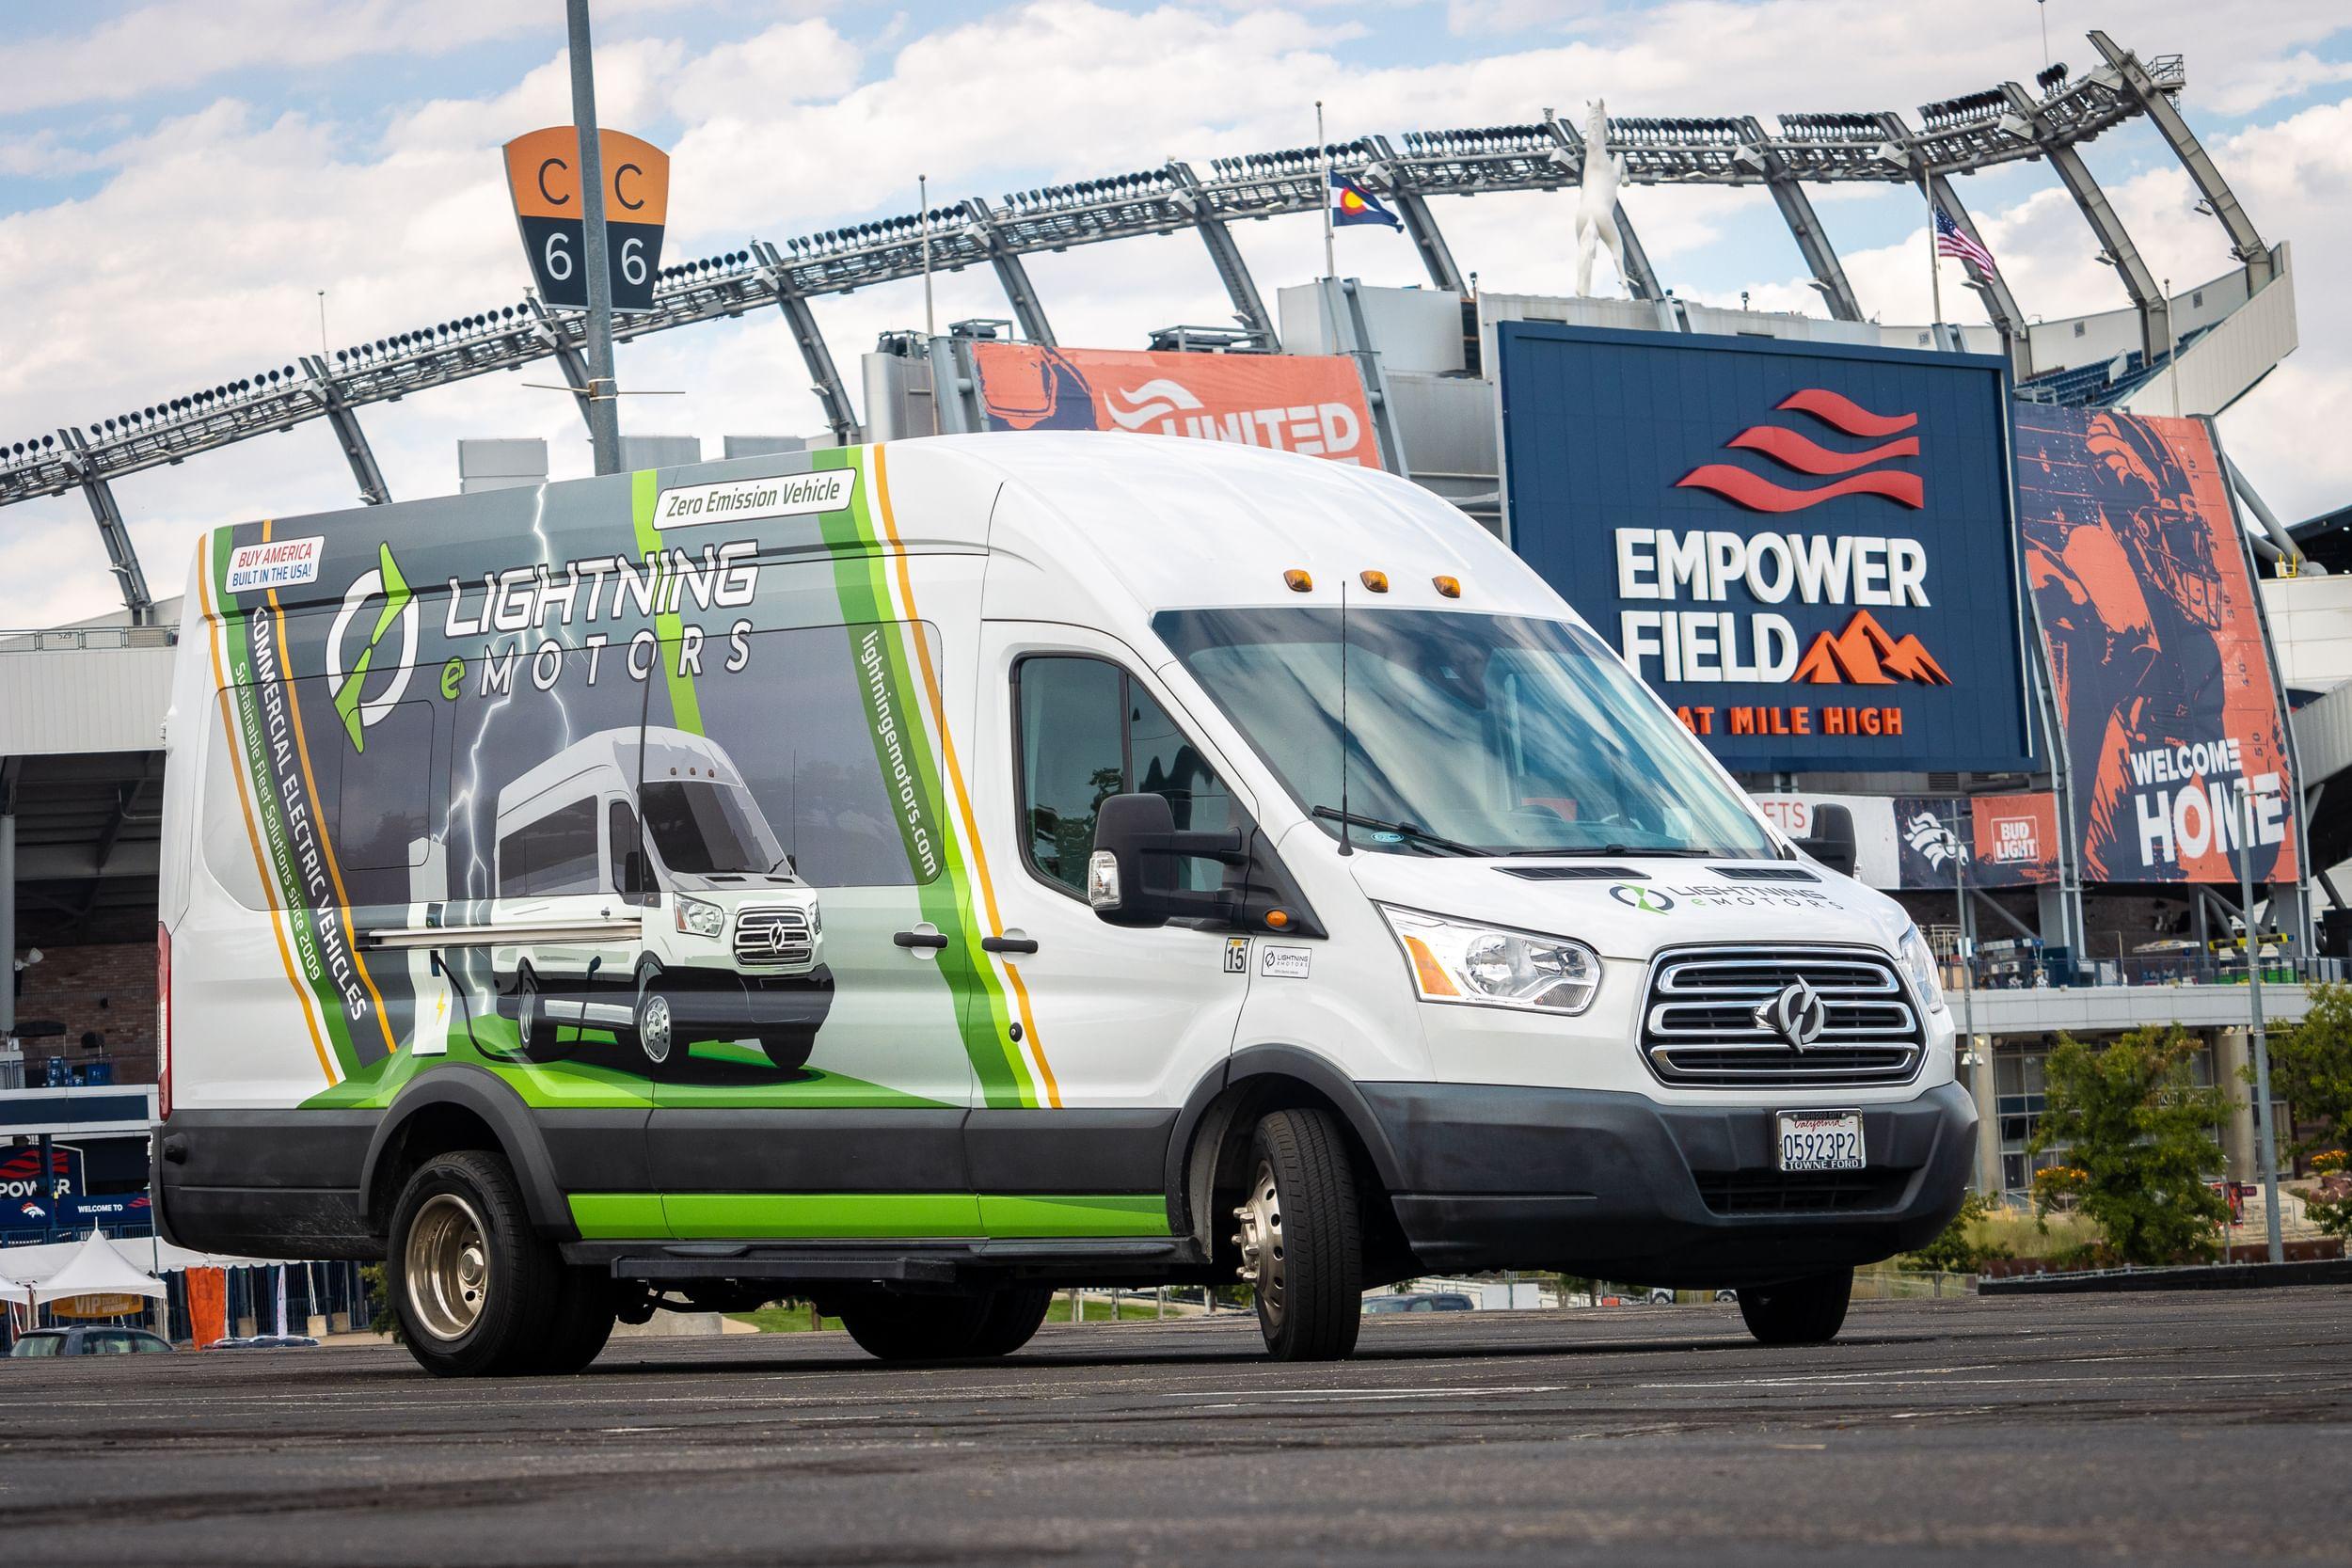 Lightning eMotors to Sponsor Denver Broncos Football Club